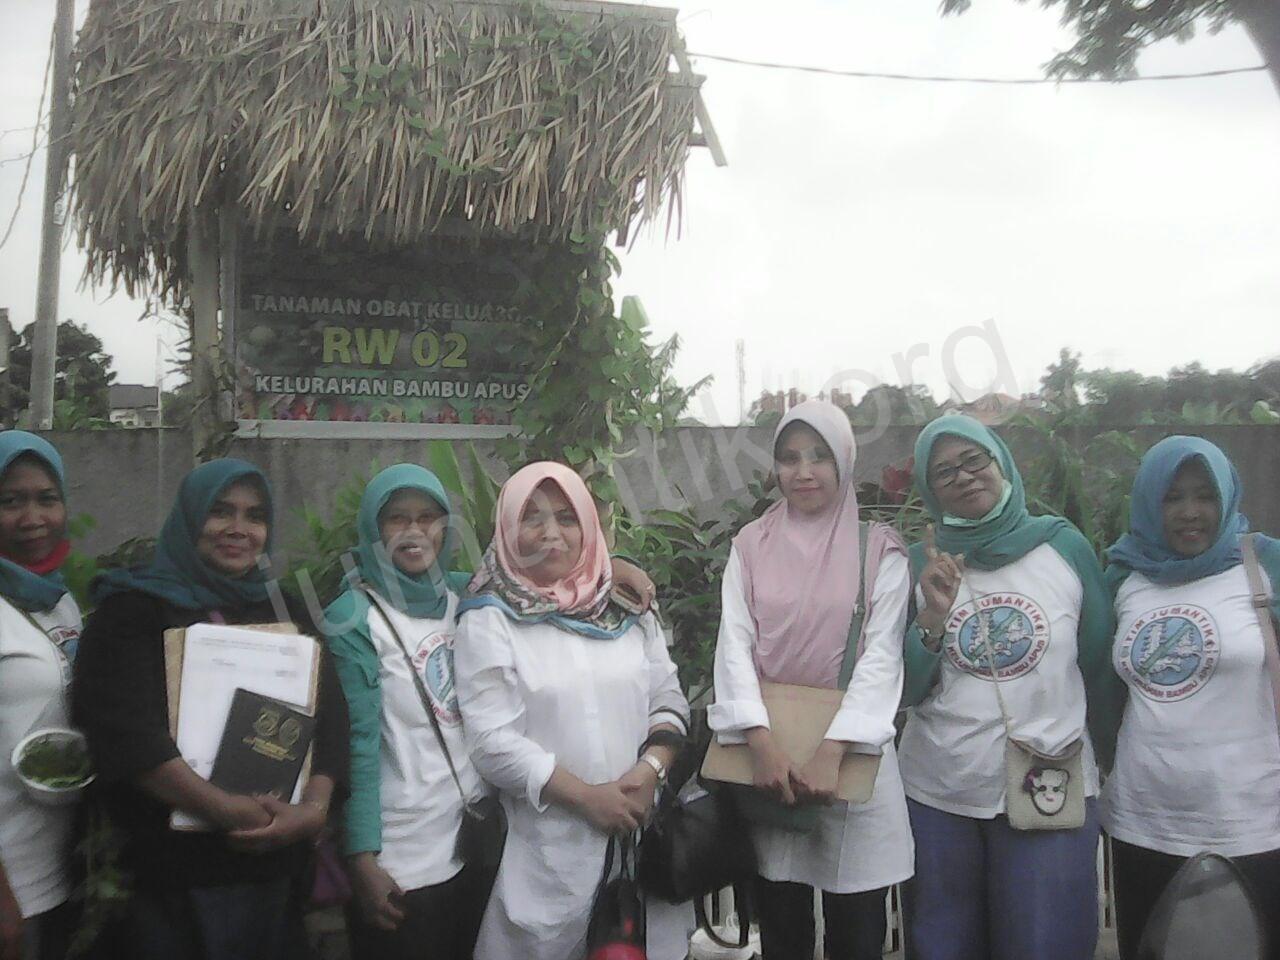 Jumantikers_gerebek_kampung_kelurahan_bambu_apus09.jpg